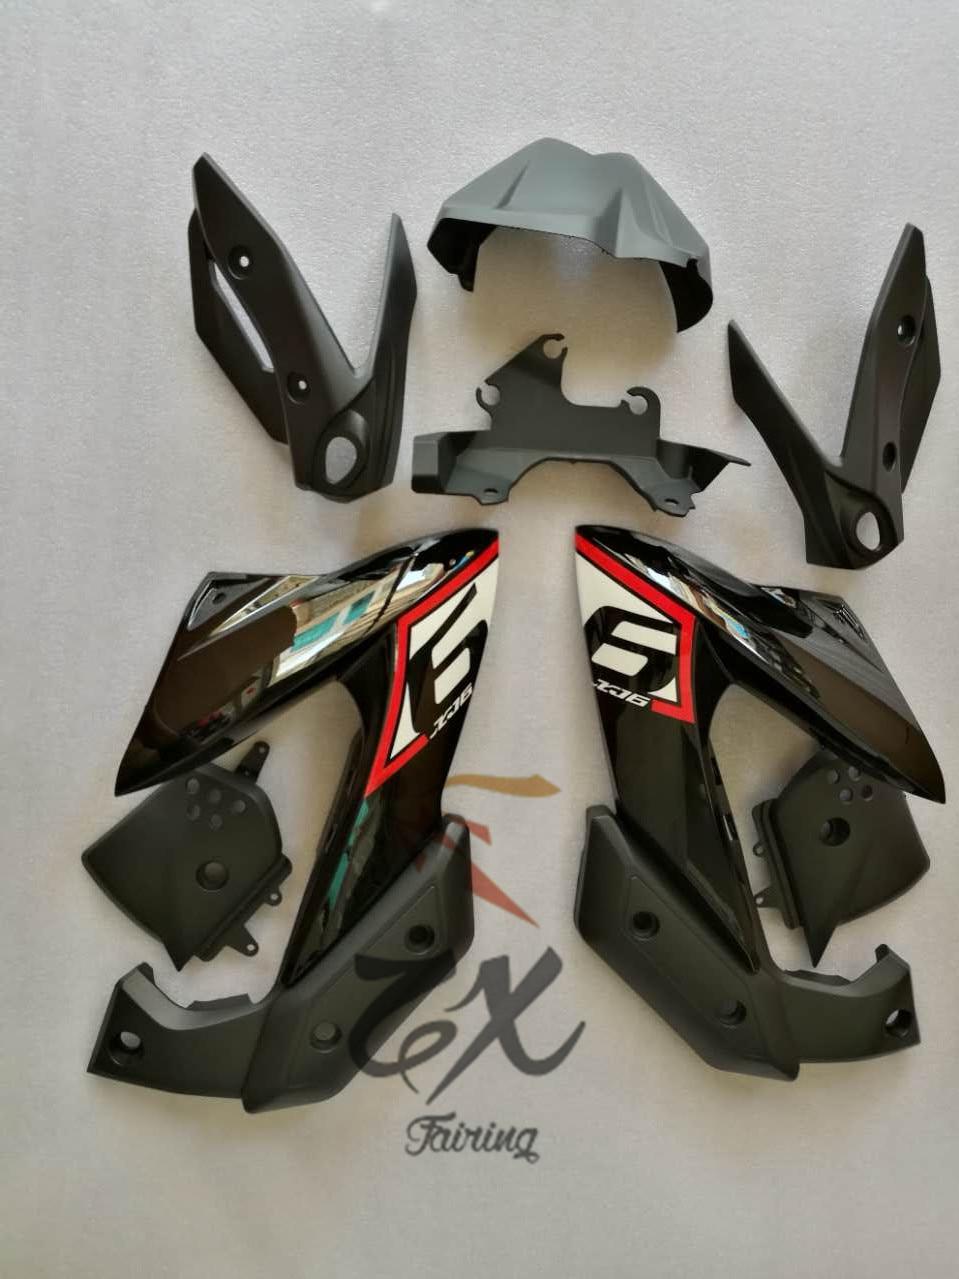 Motorcycle  ABS Plastic Injection Fairing Kit Bodywork Unpainted Bodywork Fairing For Yamaha XJ6 2009-2012 09 10 11 12 Good